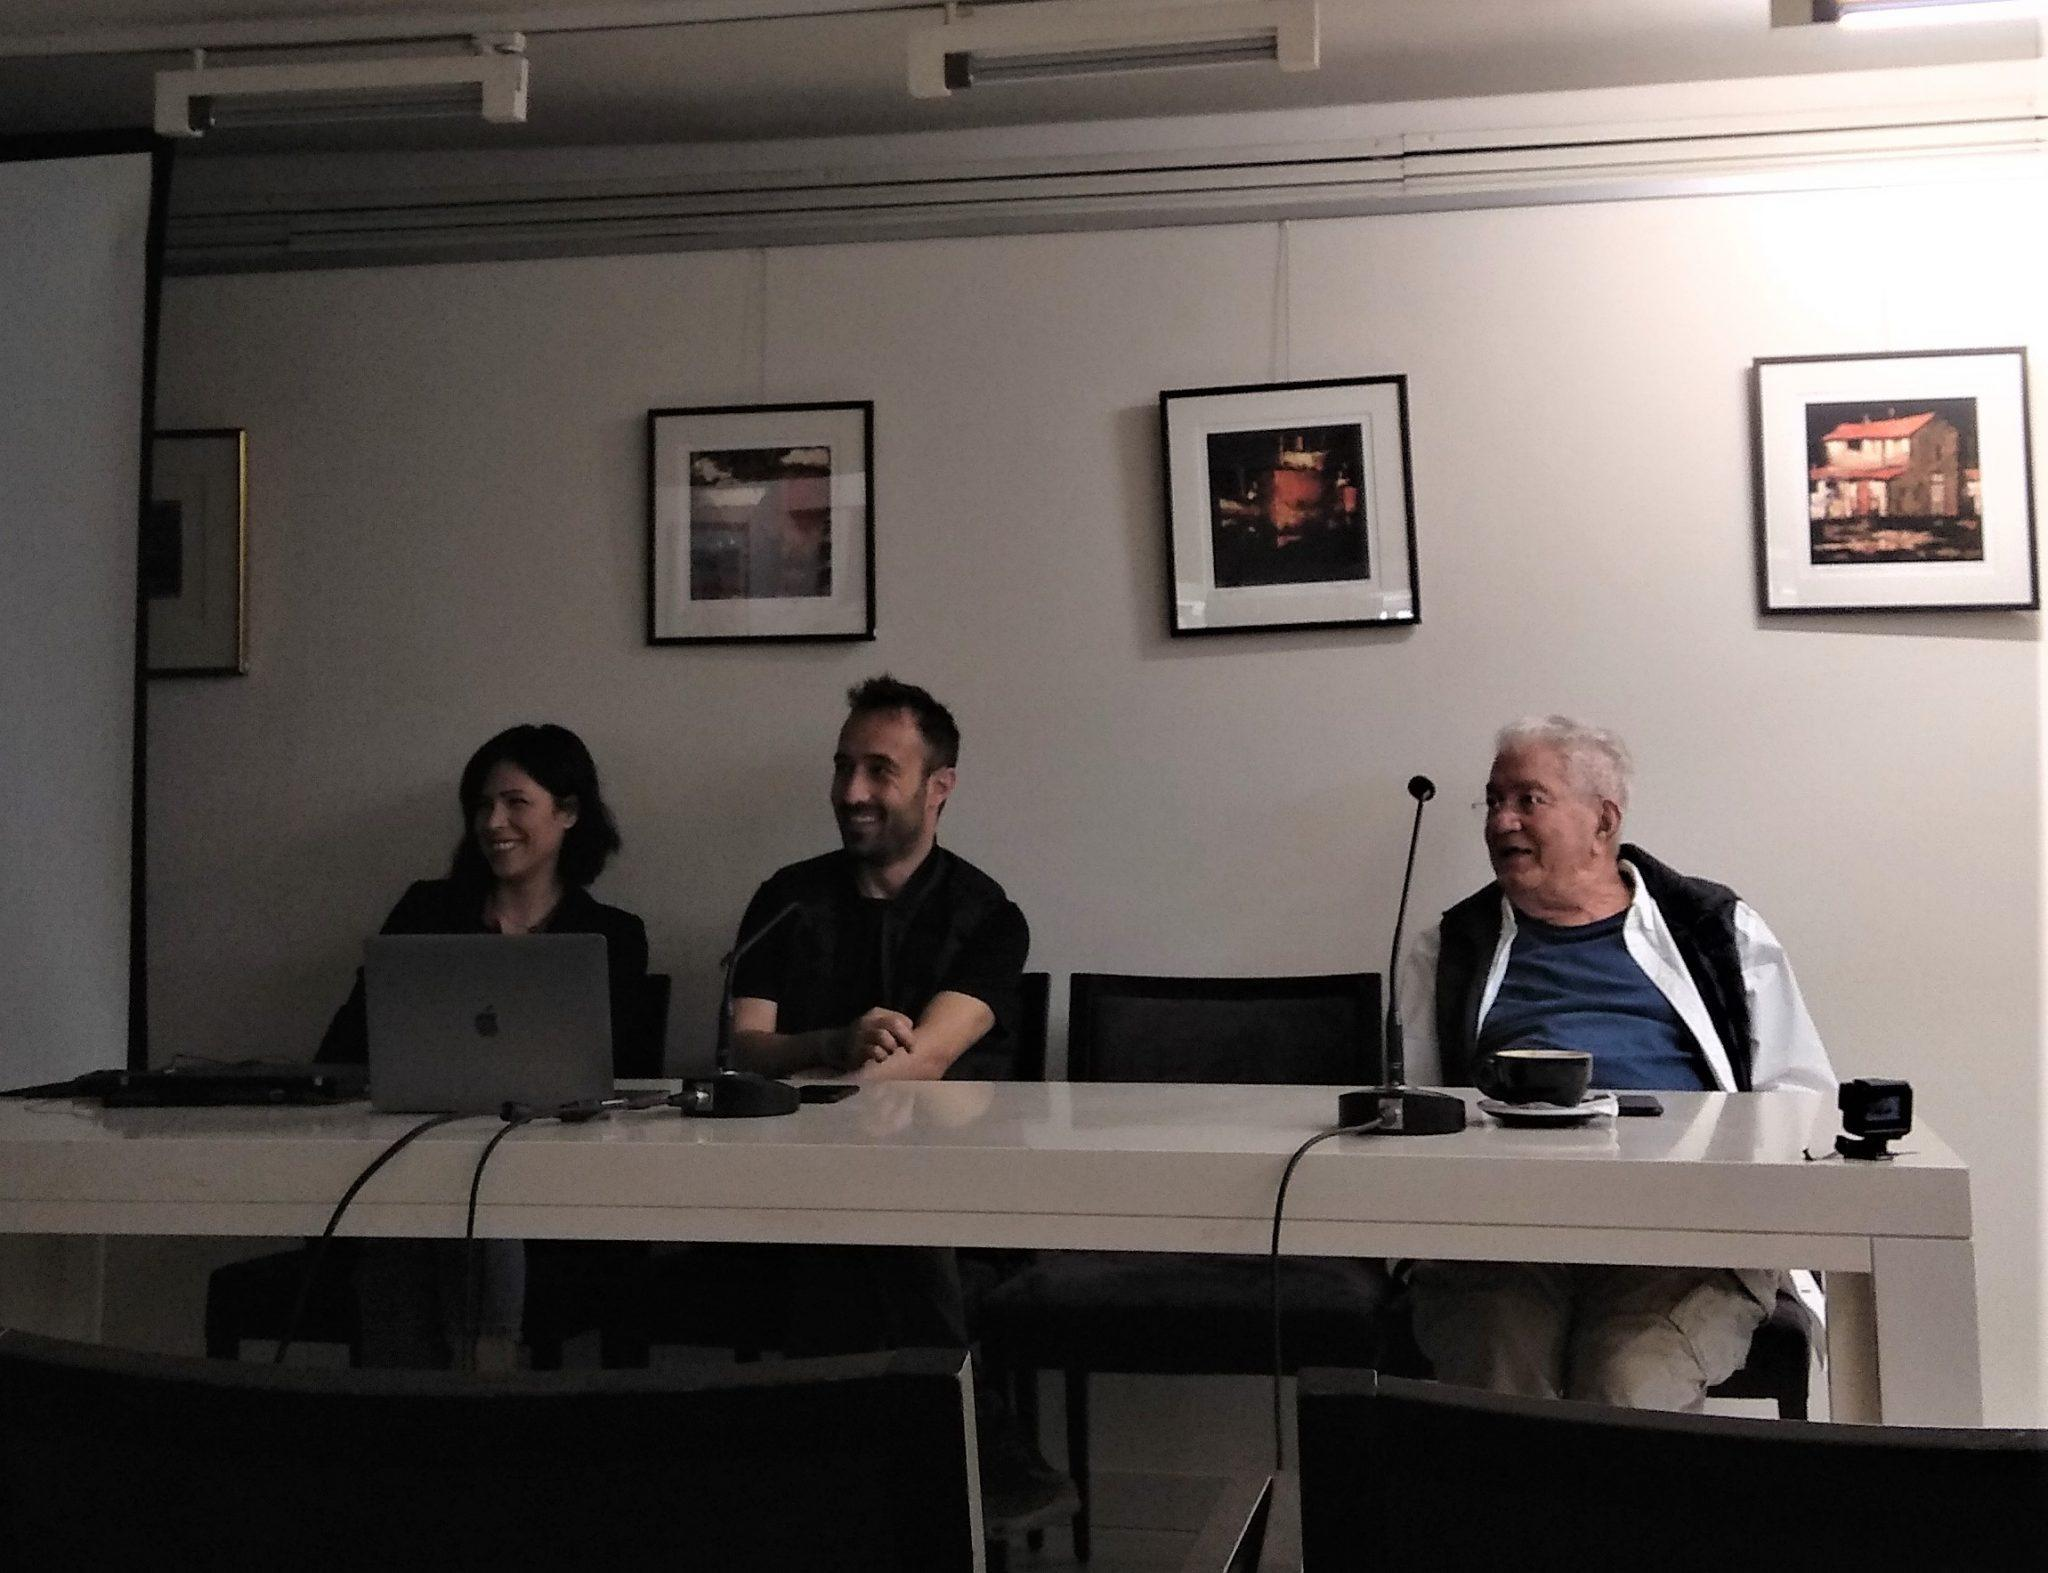 13th TiSFF | Η αγαπημένη διοργάνωση των σινεφίλ επιστρέφει ανανεωμένη